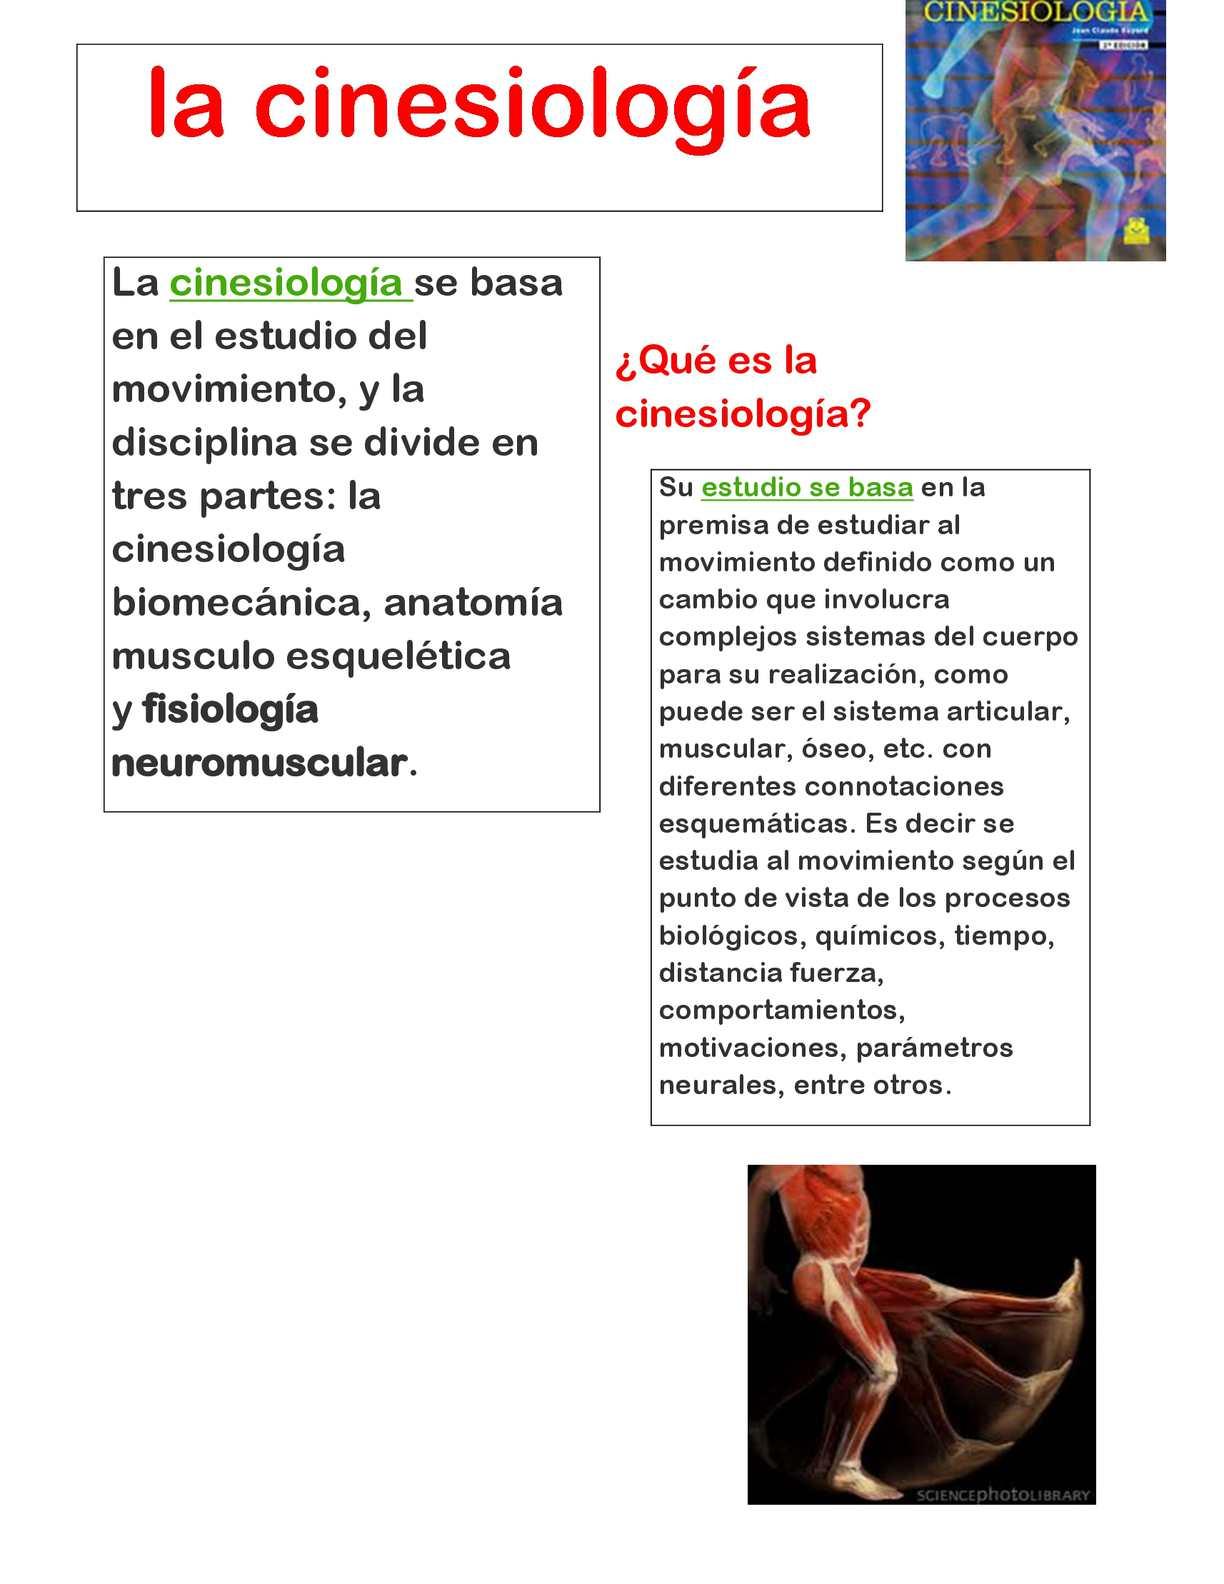 Calaméo - PERIODICO CINESIOLOGIA